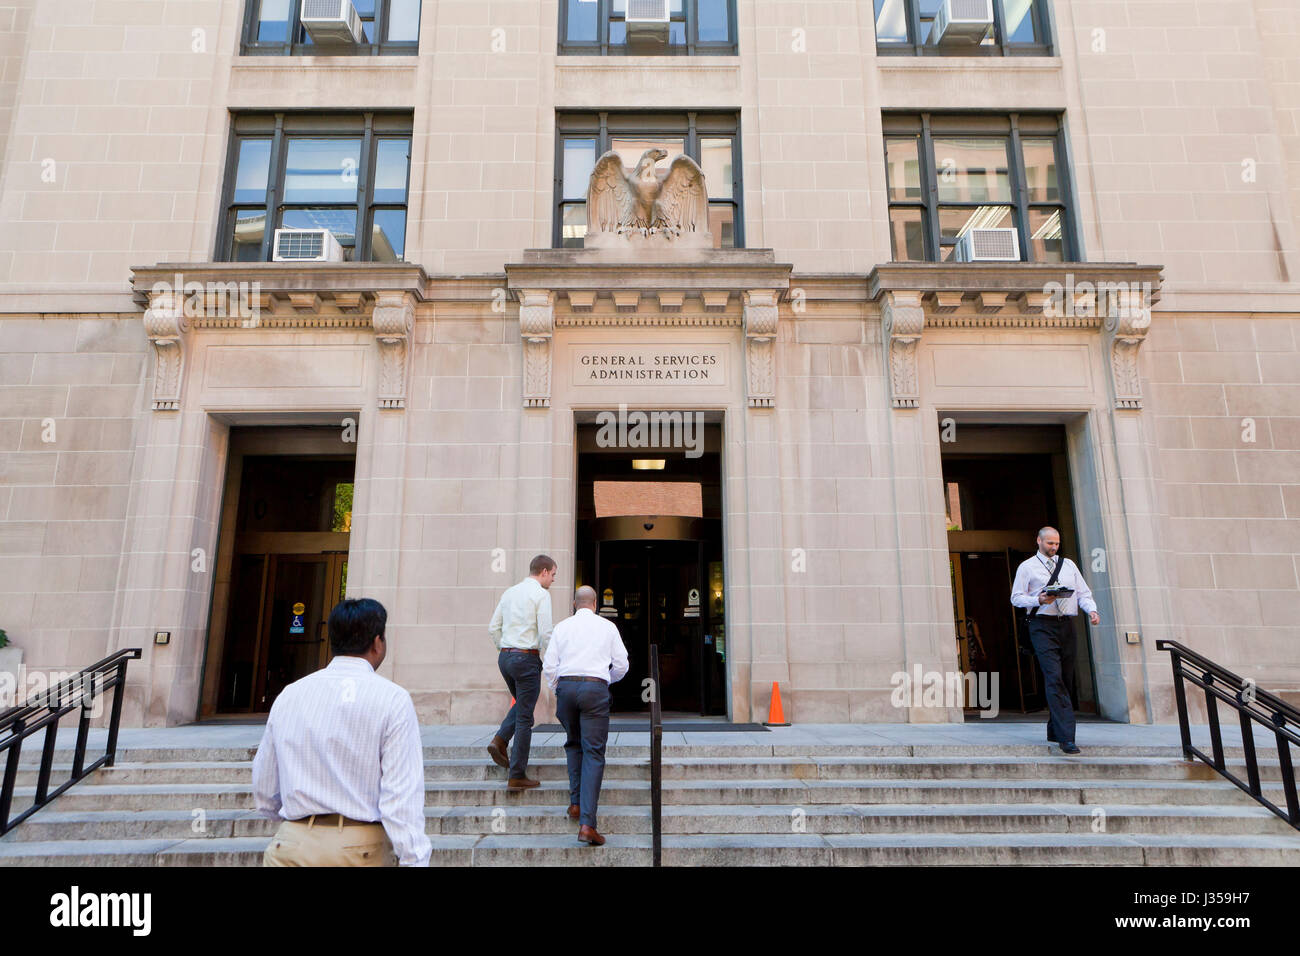 General Services Administration Building - Washington, Dc, USA Stockbild